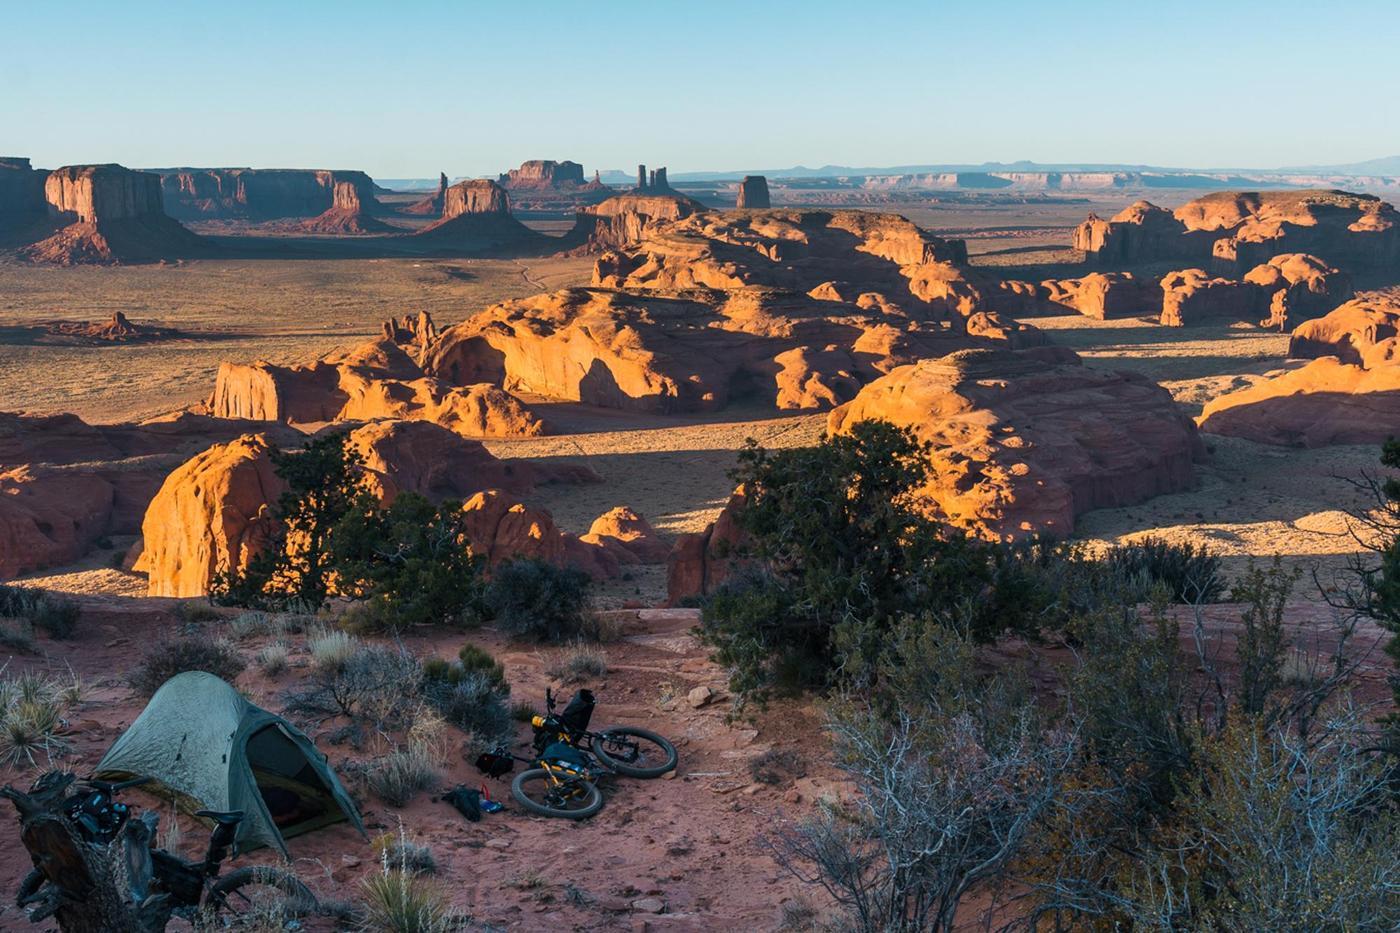 Help the Navajo Nation in Kayenta During Covid19